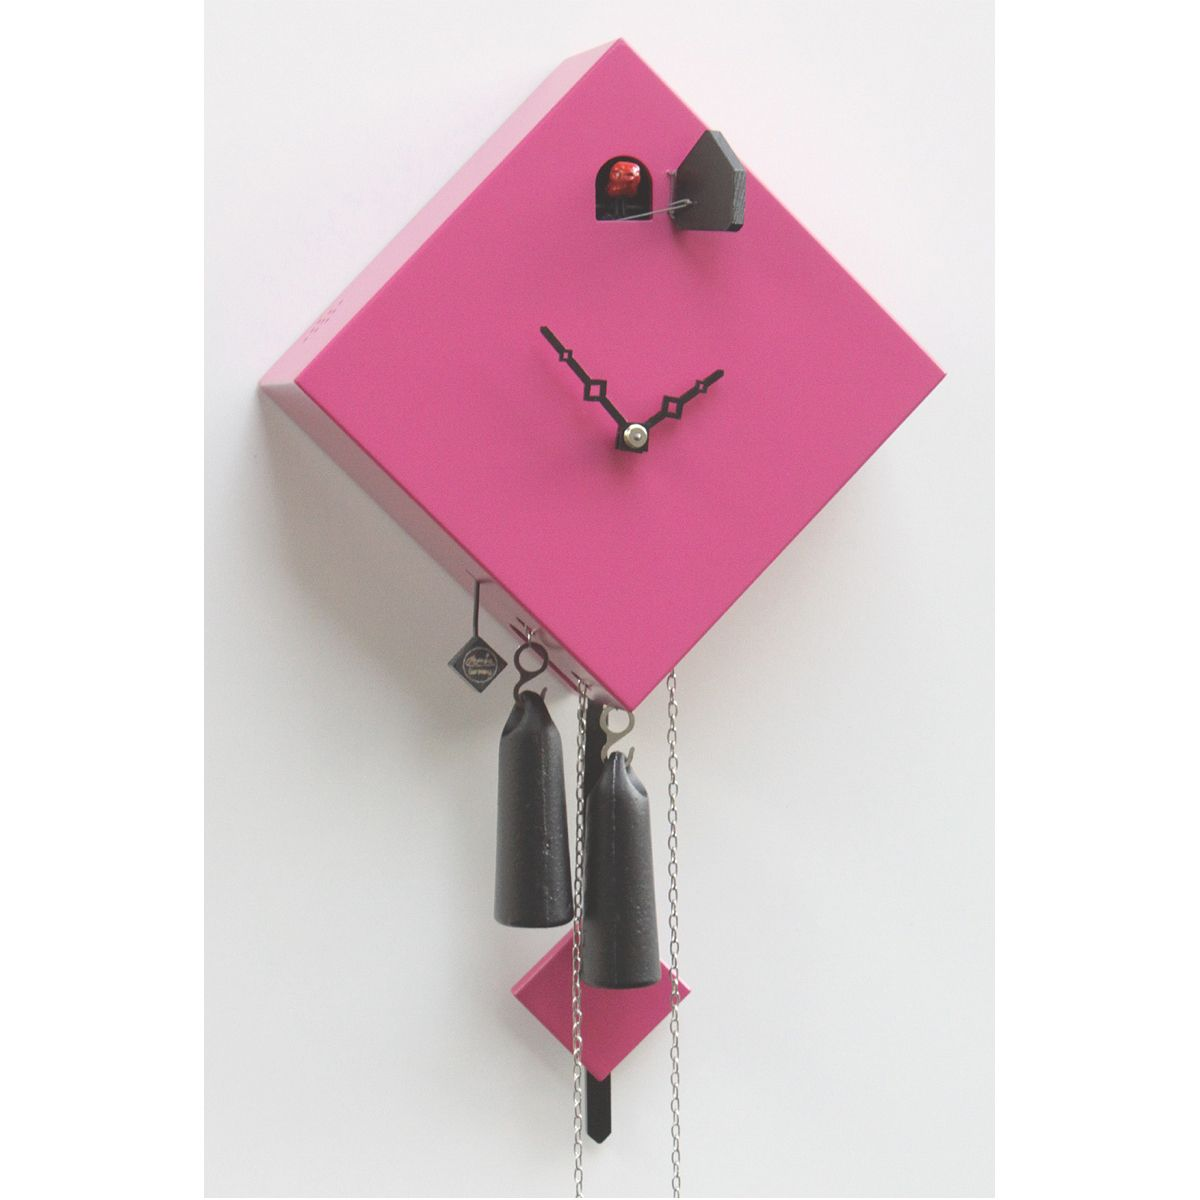 Cuckoo Design In Diamond Shape Pink Modern Cuckoo Clocks Modern Clock Clock